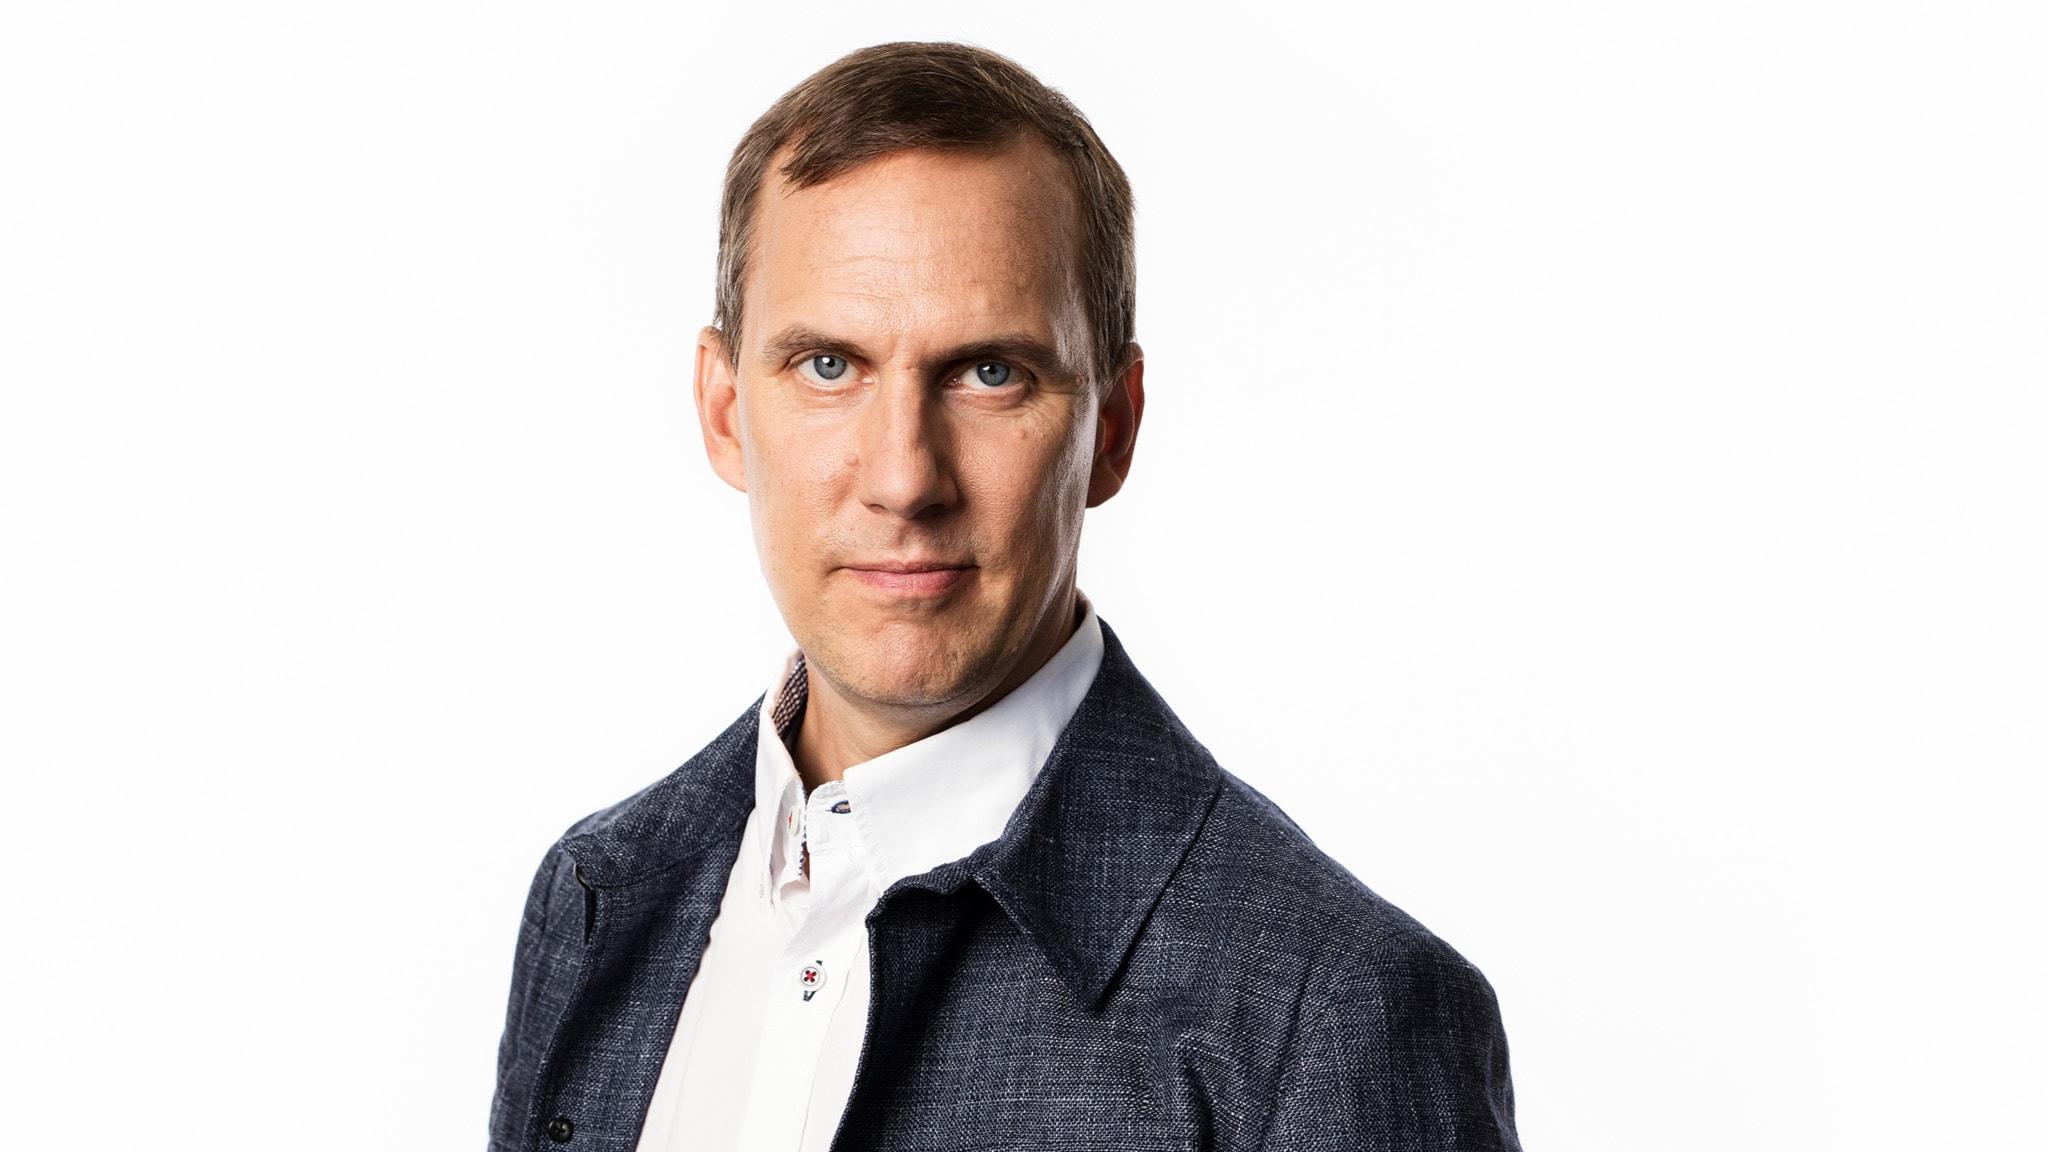 Johan Bergendorff. Sveriges Radios korrespondent om Global hälsa. Ekot Sveriges Radio.